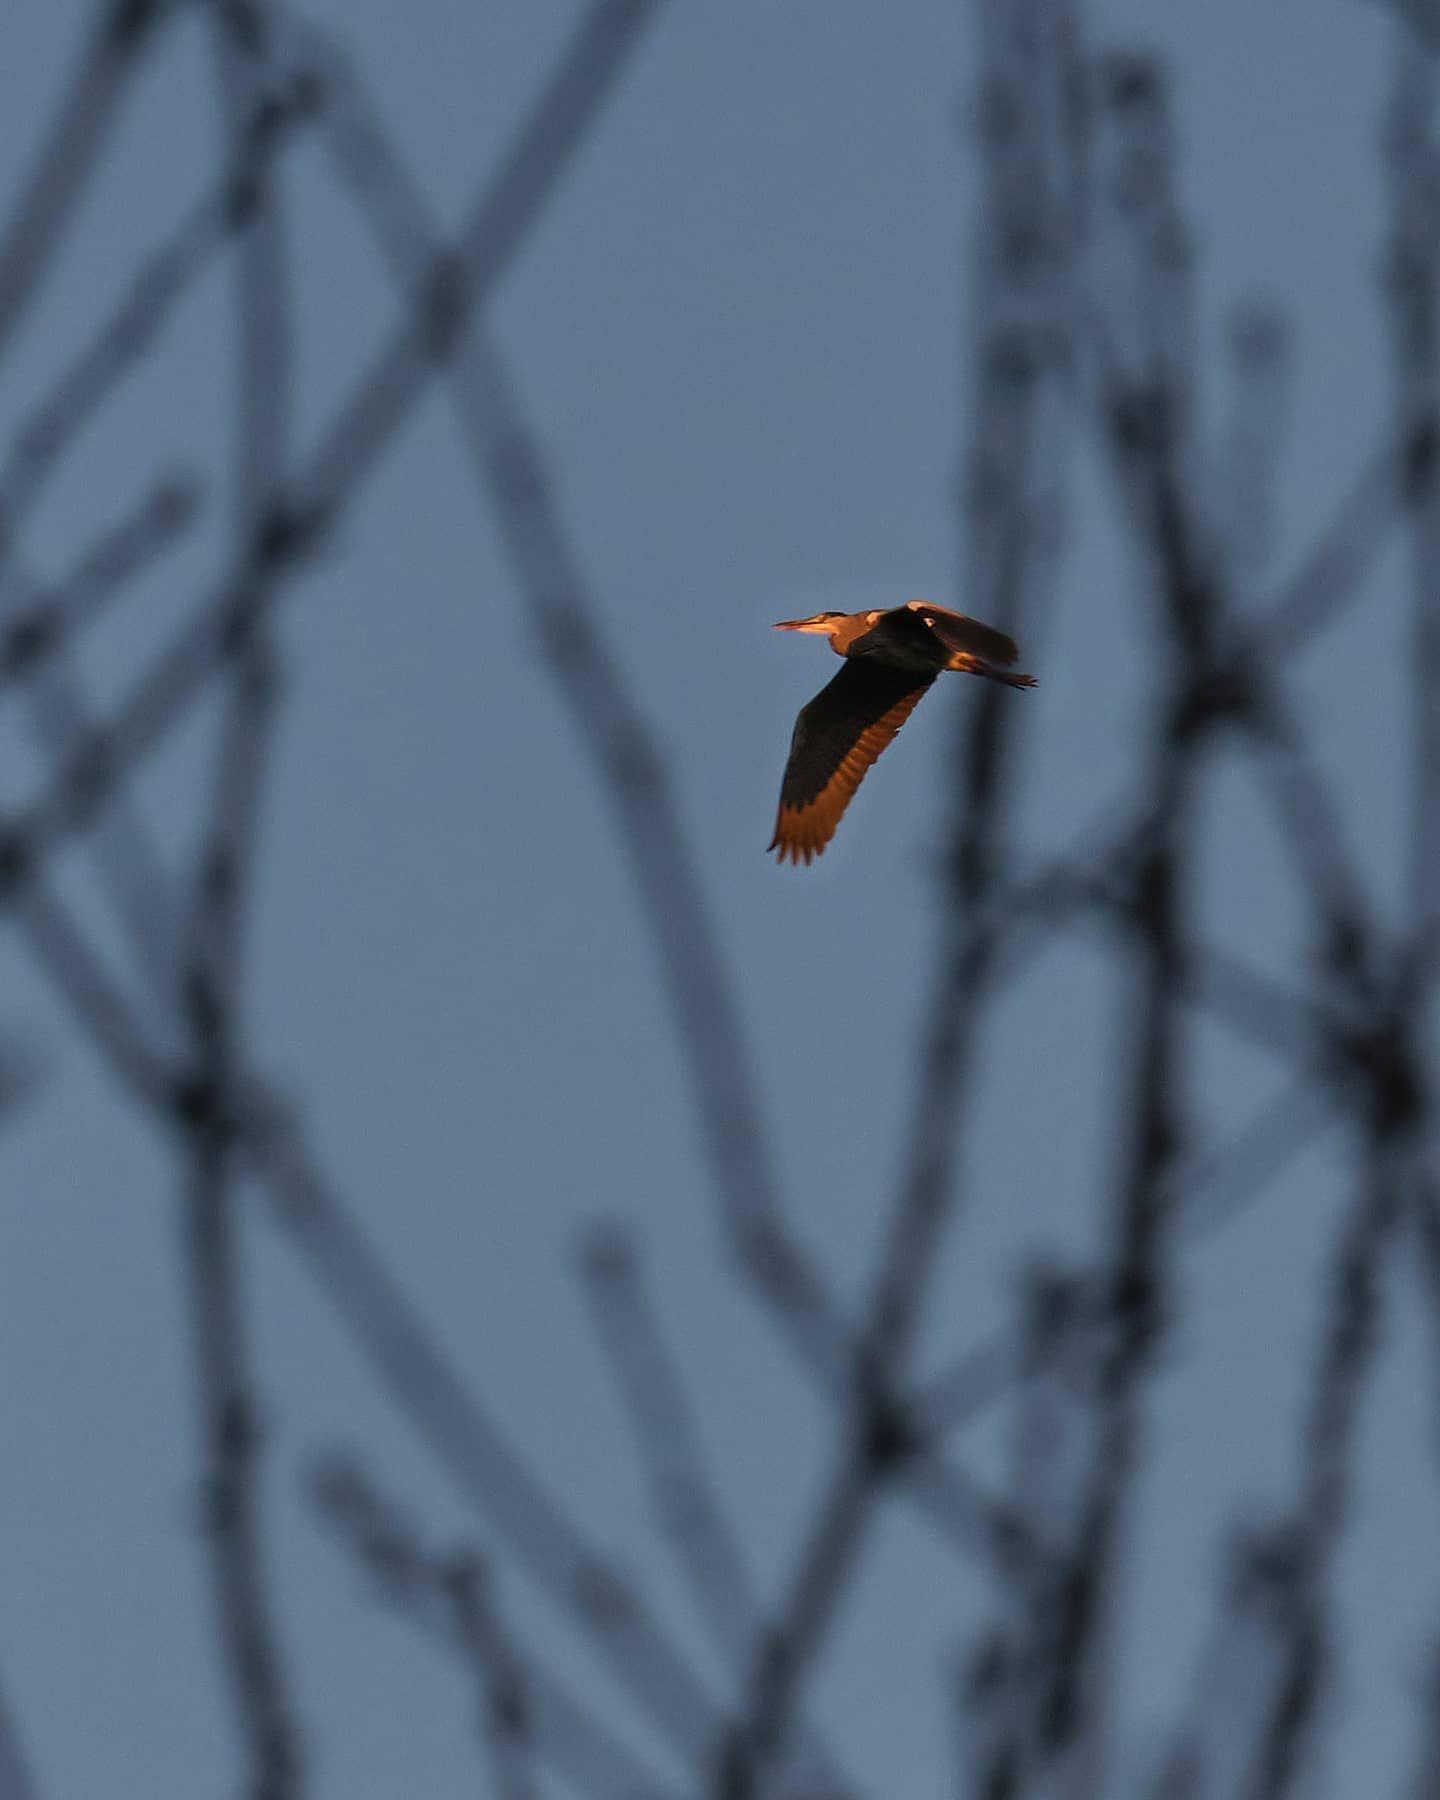 Heron   Last Light .  Fujiflim X-T30  XF55-200mm   ƒ/16   1/300   200 mm   ISO800  Leusden The Netherlands . . . . . . . . . #timingiseverything #inthemoment #timingiseverything #fujilovers #amazingbirds #bestbirdsofinstagram #greyheron #bird_photography #wildlifebirds #birdphotos #bird_perfection #dailybirdpix #eyes_up #bestbirdshot #your_bird_capture #birds_natural #ig_bird_watchers #instaholland #mooinederland #nederland_ontdekt #netherlands_captured #dutch_best #living_netherlands #toeristin